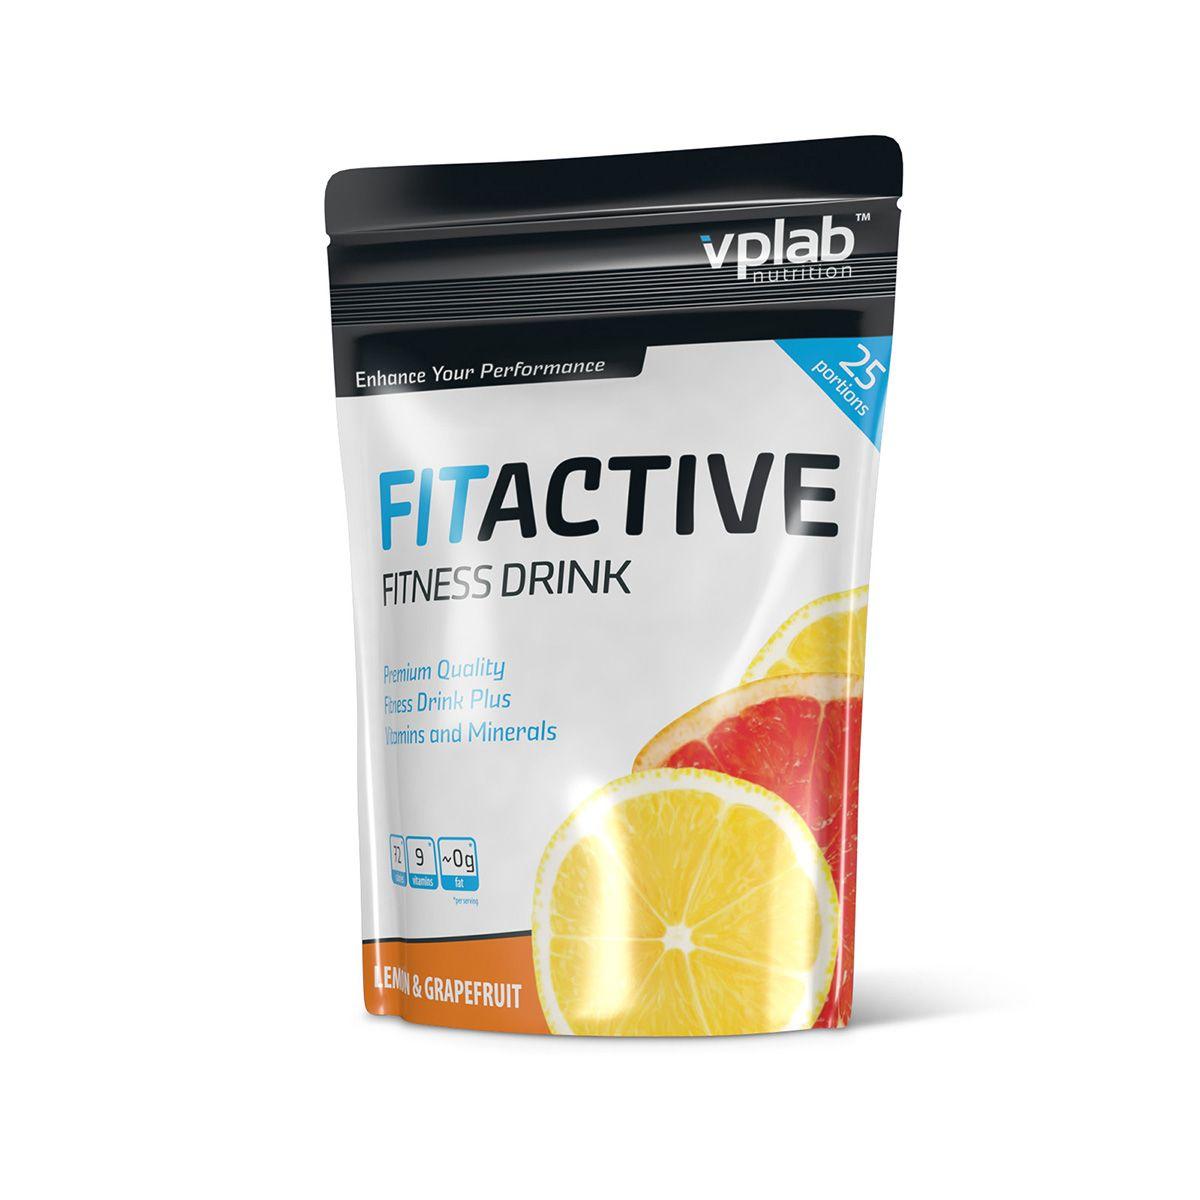 Изотоник VPLab FitActive Fitness Drink 500г лимон-грейпфрут ( V0713 )